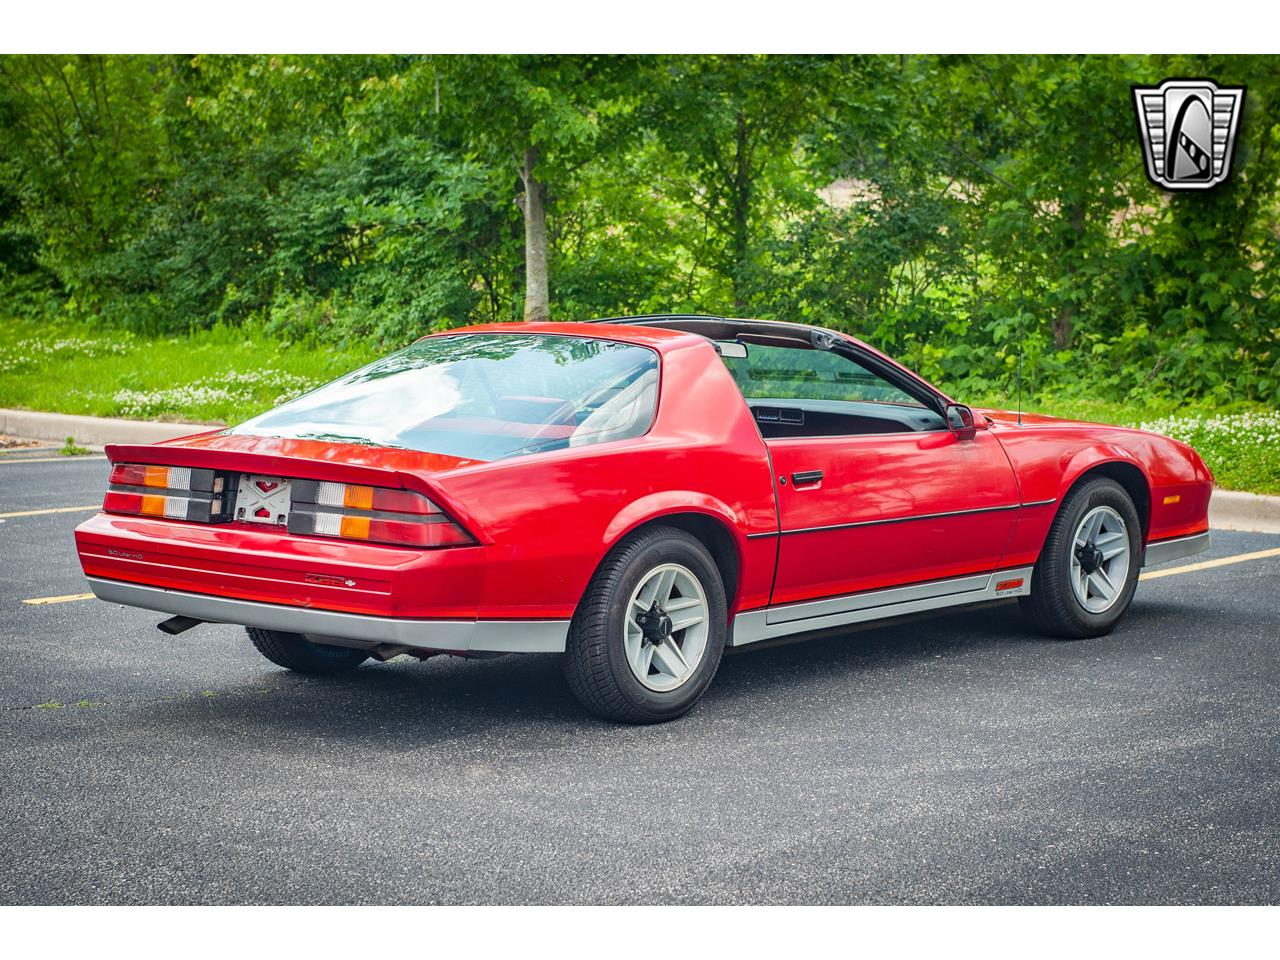 Large Picture of 1984 Chevrolet Camaro located in O'Fallon Illinois - $9,500.00 - QB9Y